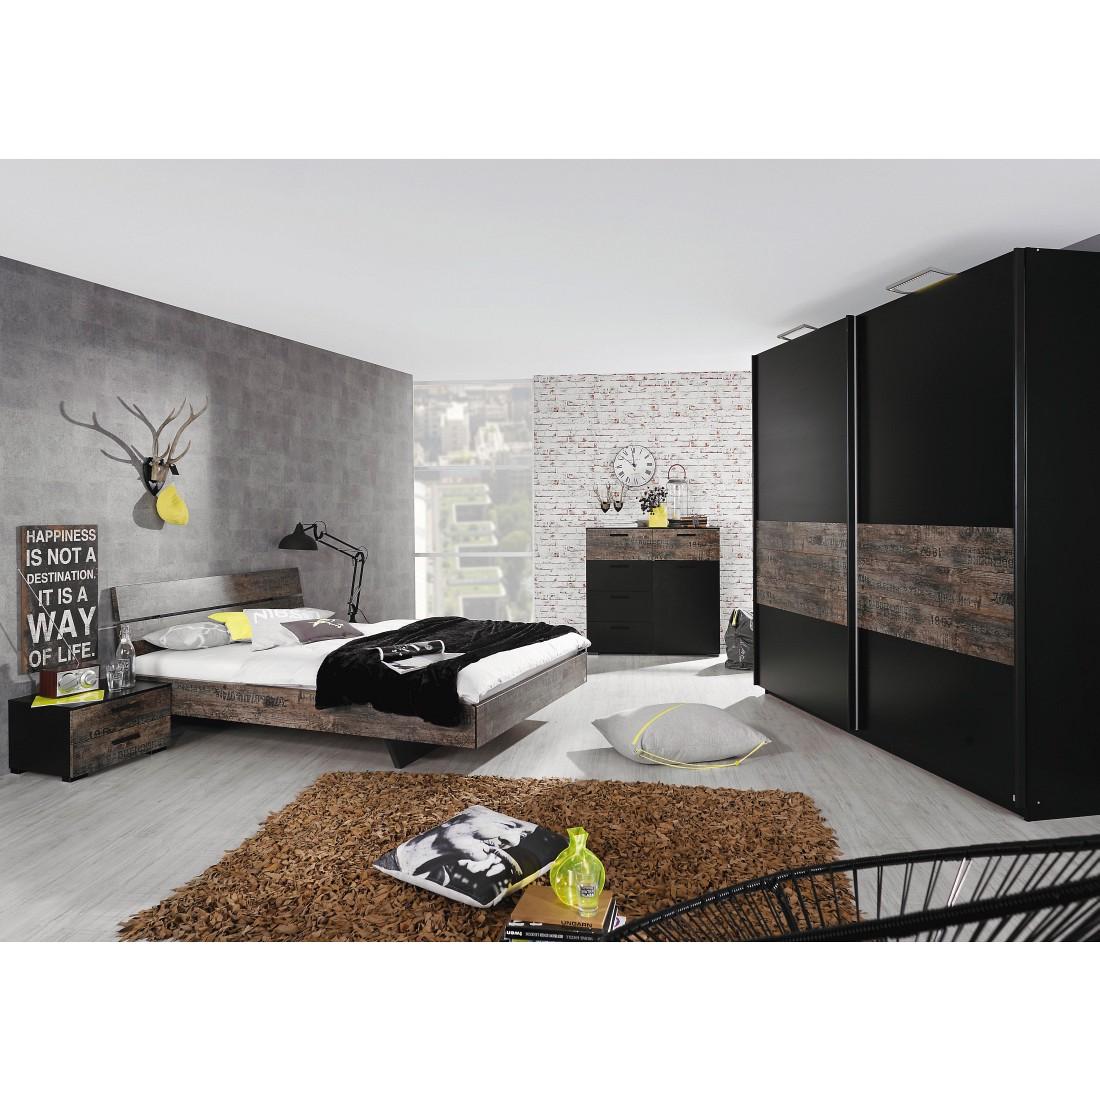 Schlafzimmerset Sumatra I - Schwarz / Vintage Braun - Liegefläche Bett: 140 x 200cm, Rauch Select